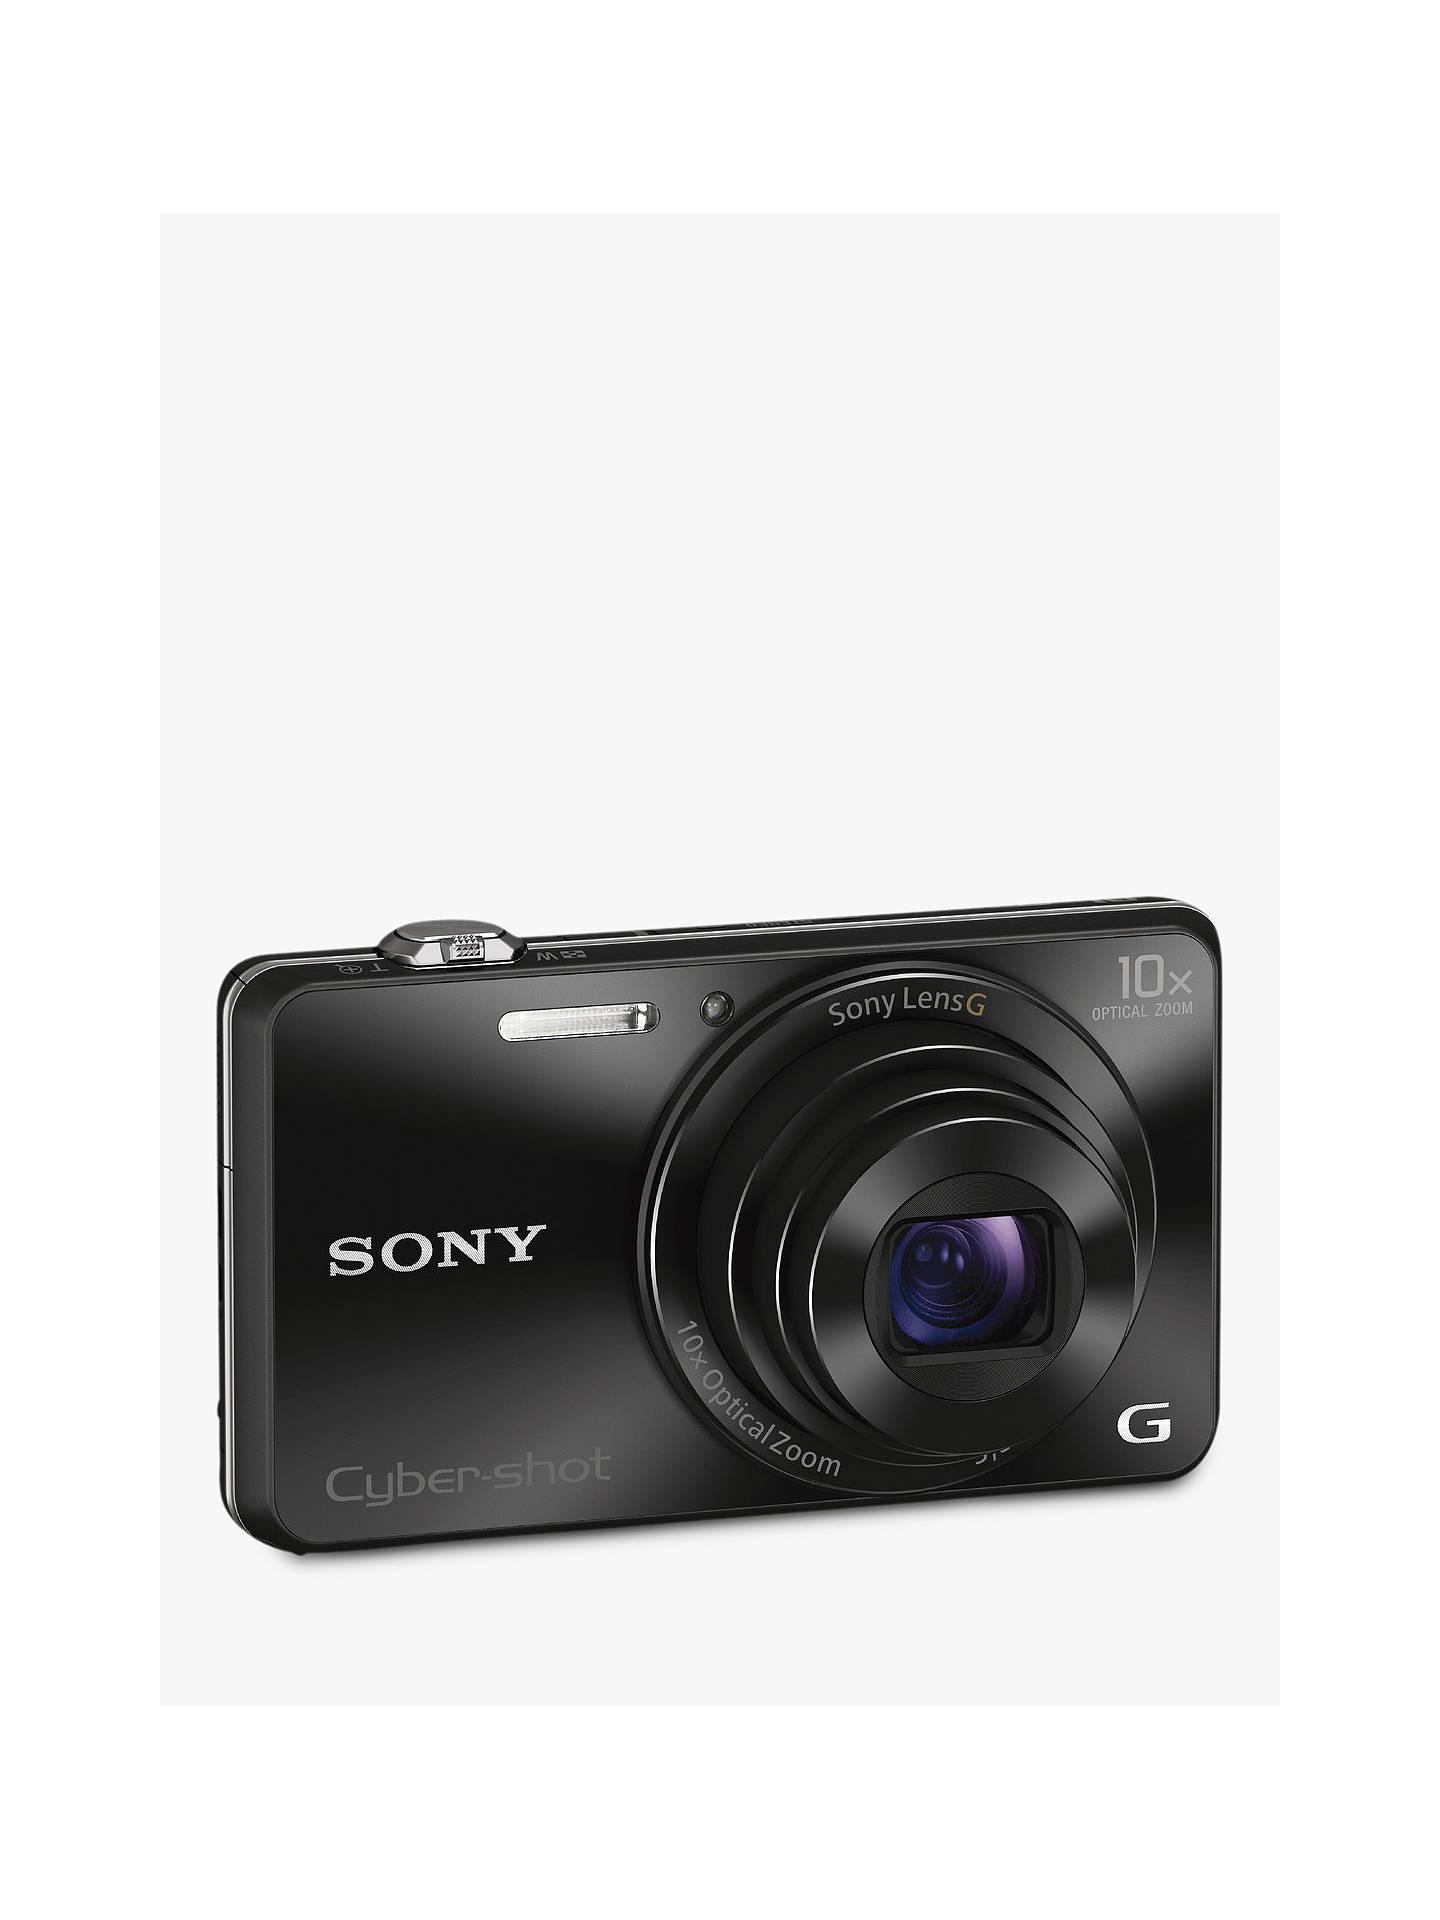 "Sony Cyber-shot DSC-WX220 Camera, HD 1080p, 18 2MP, 10x Optical Zoom,  Wi-Fi, NFC, 2 7"" Screen"